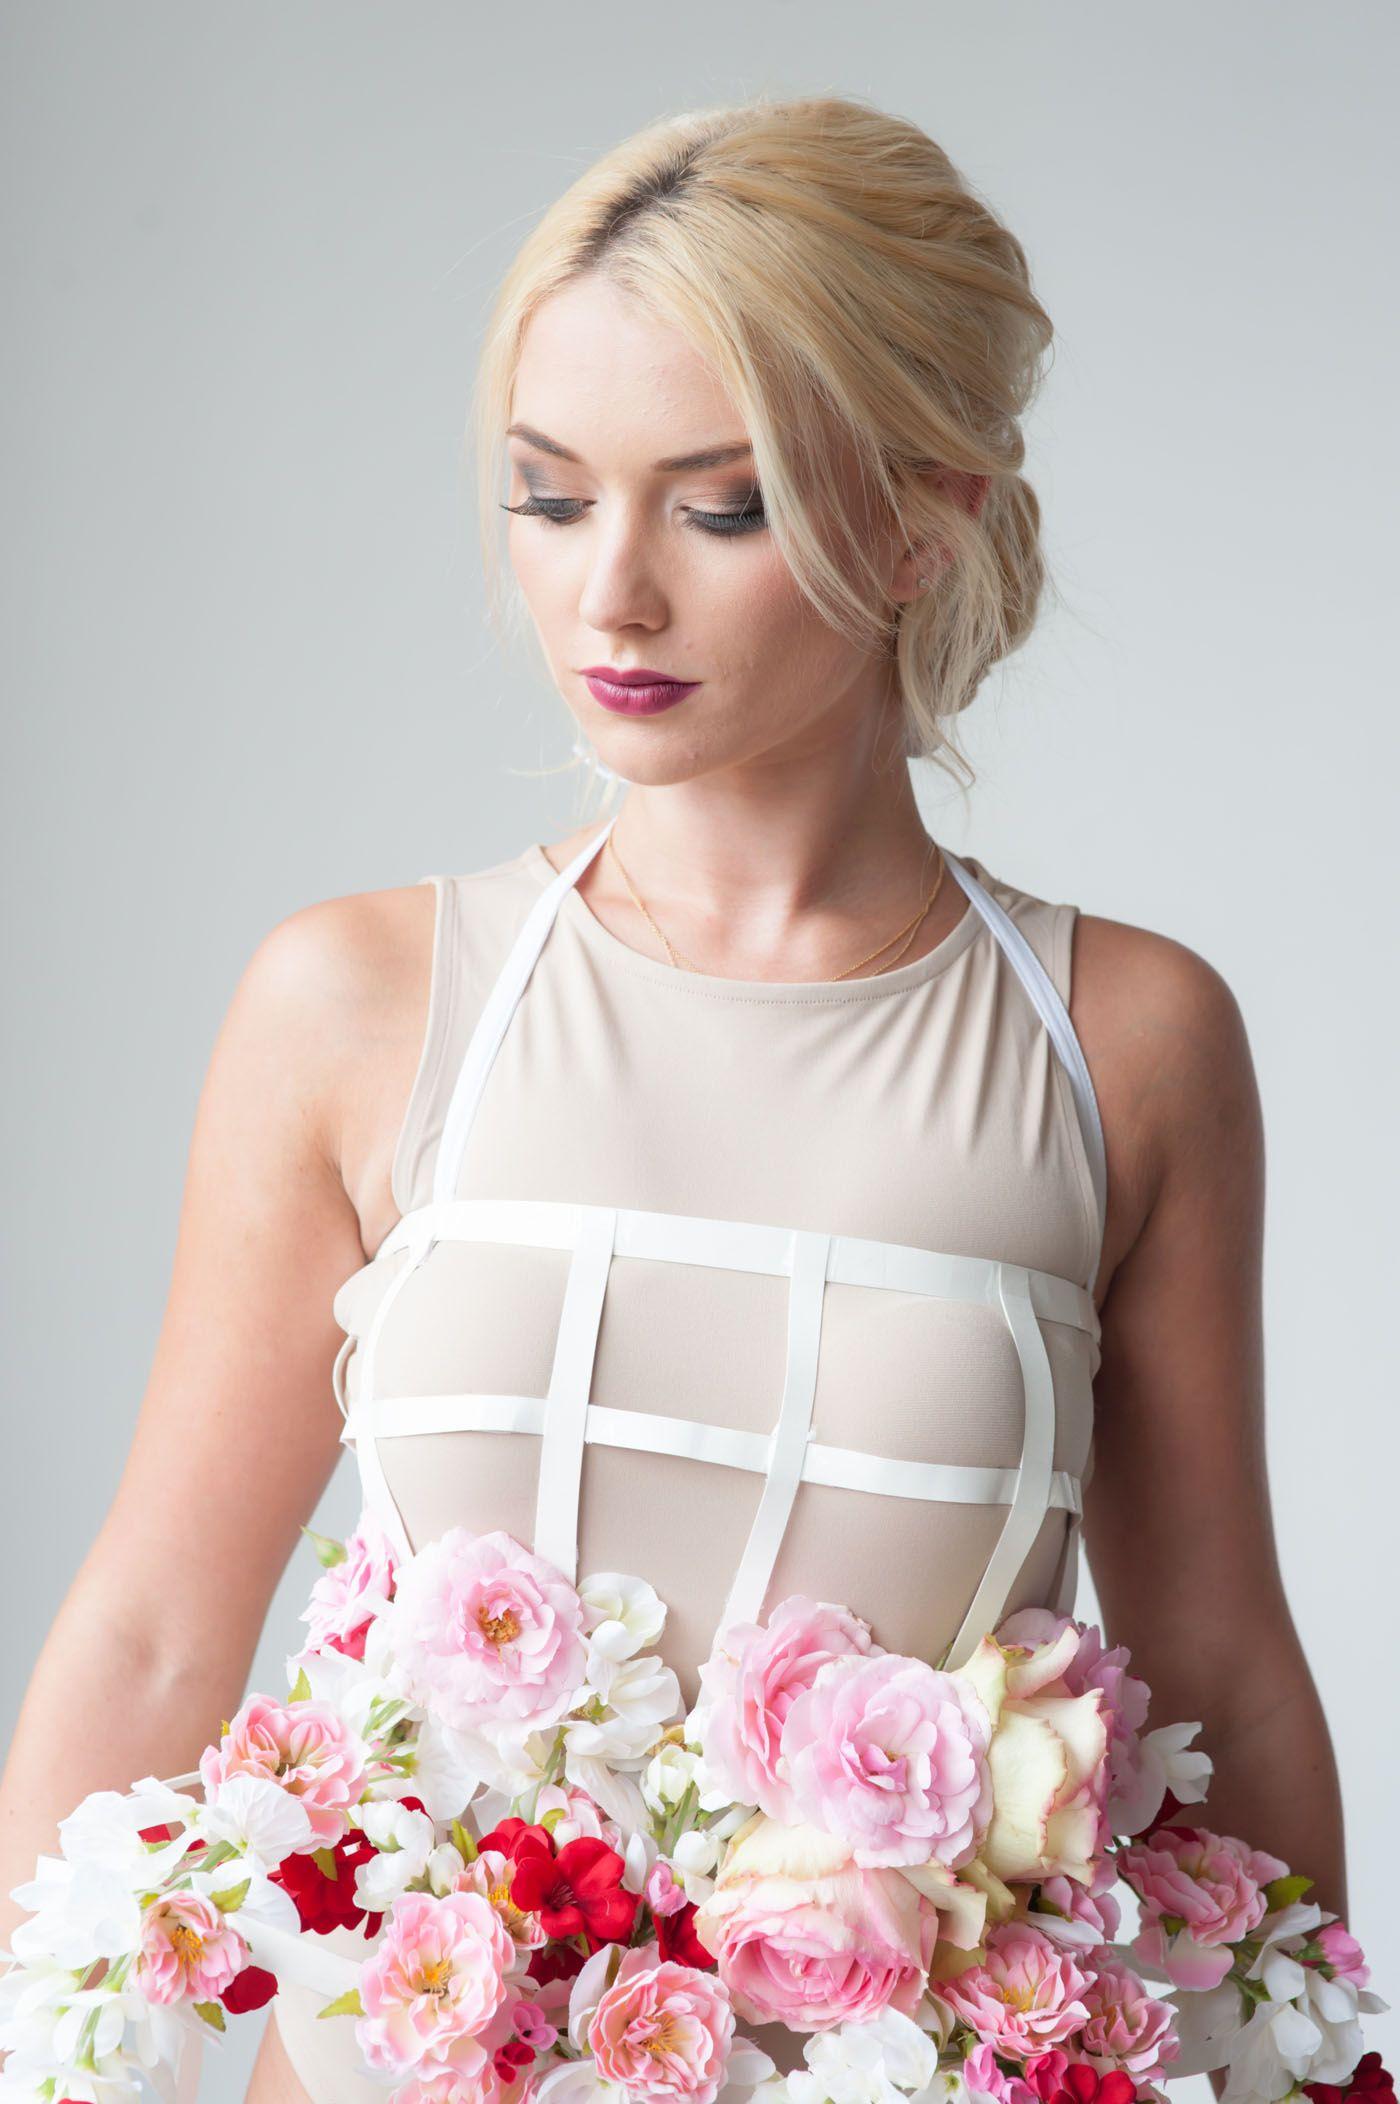 Edgy Glam Alice in Wonderland Wedding Inspiration Alice